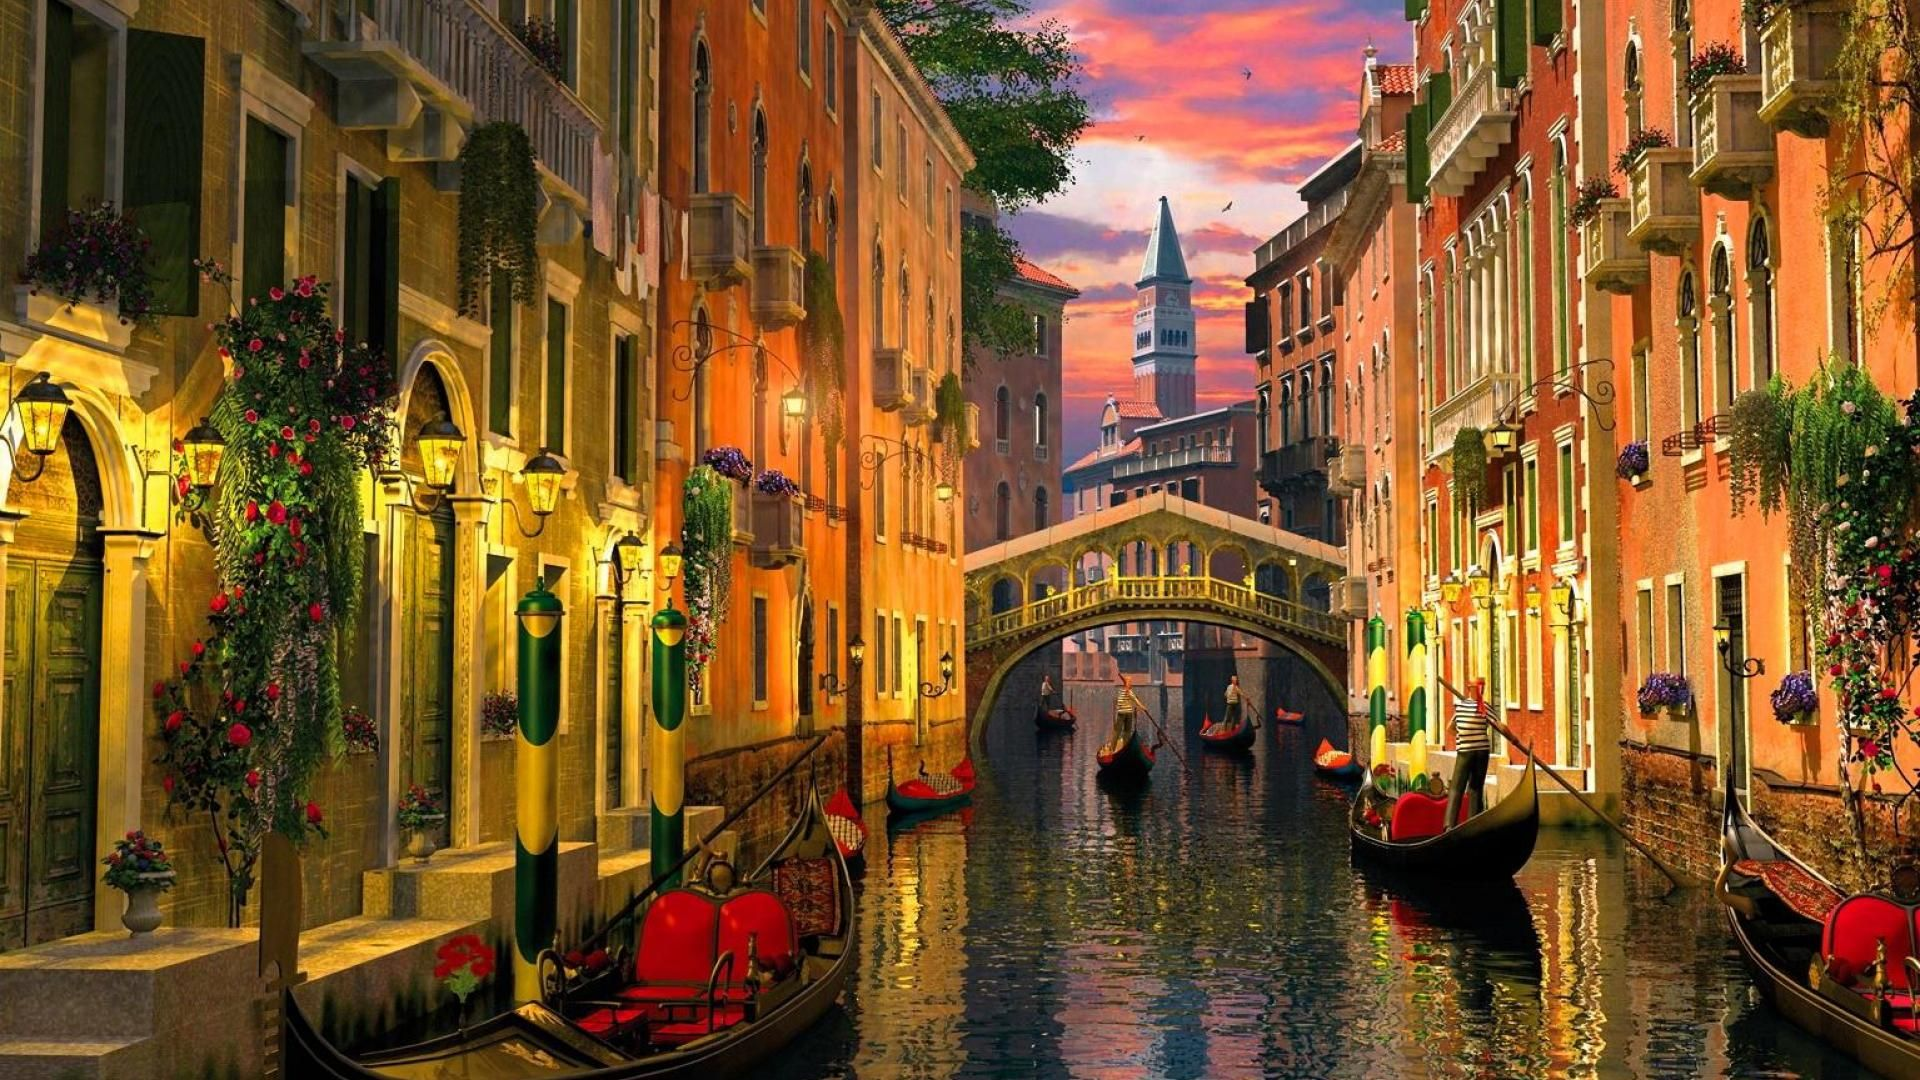 Hd wallpaper venice - Venice Italy Desktop Wallpaper Bf Hd Widescreen Wallpapers For 640 1136 Venice Wallpaper